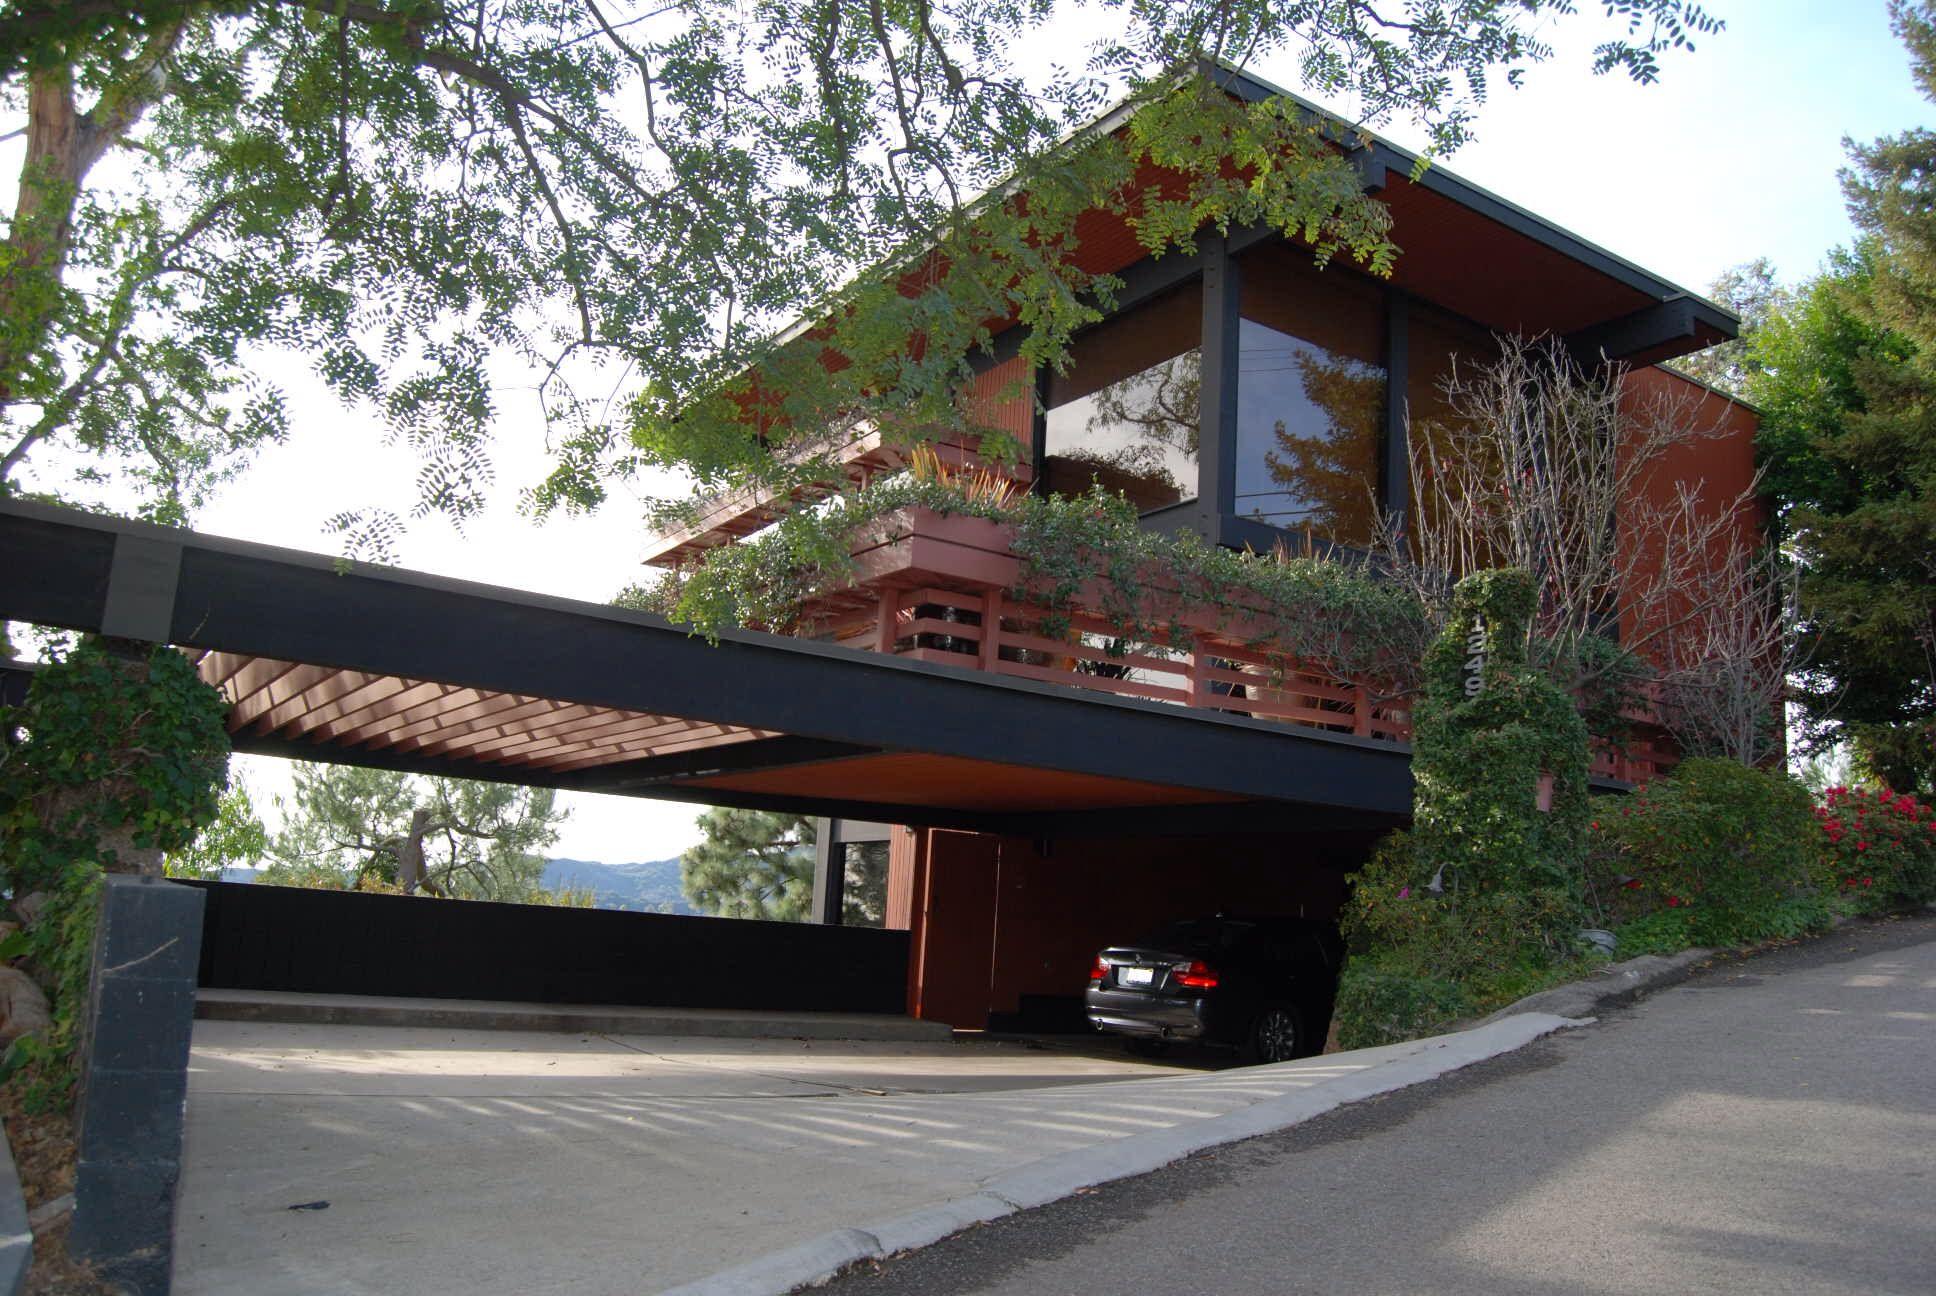 Svelte modern home featuring a carport